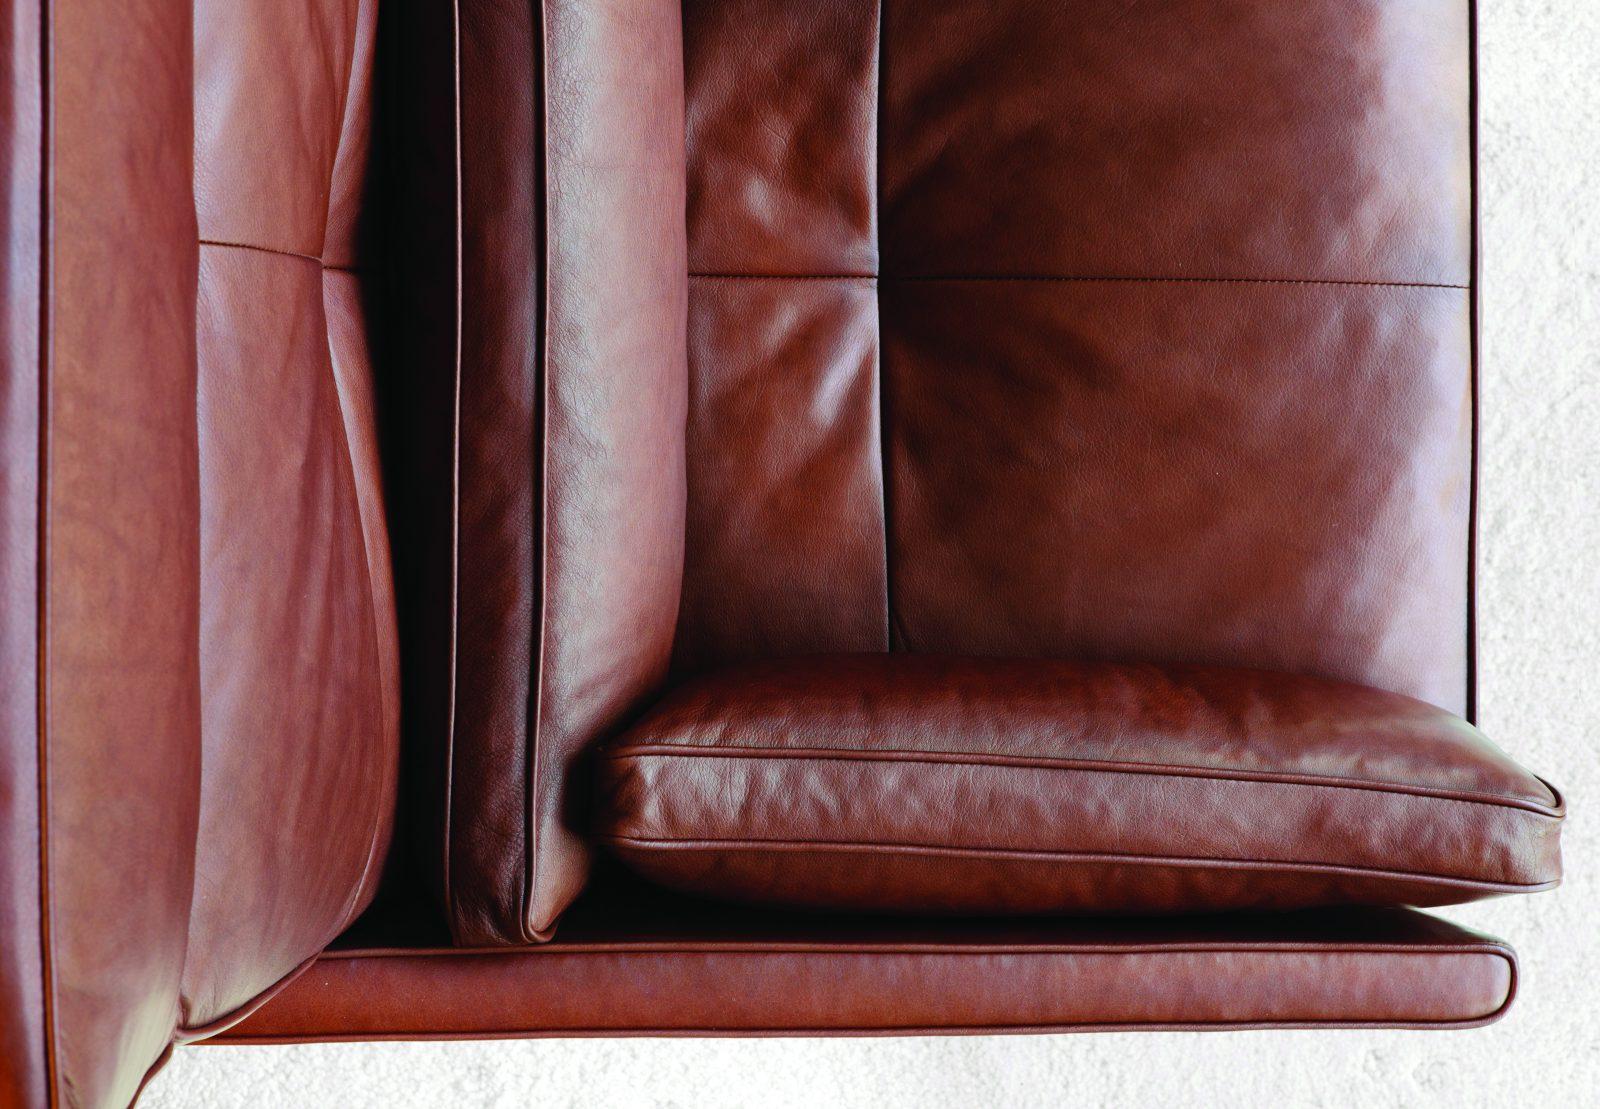 BassamFellows CB-510 High Back Lounge Chair detail, credit NIKOLAS KOENIG